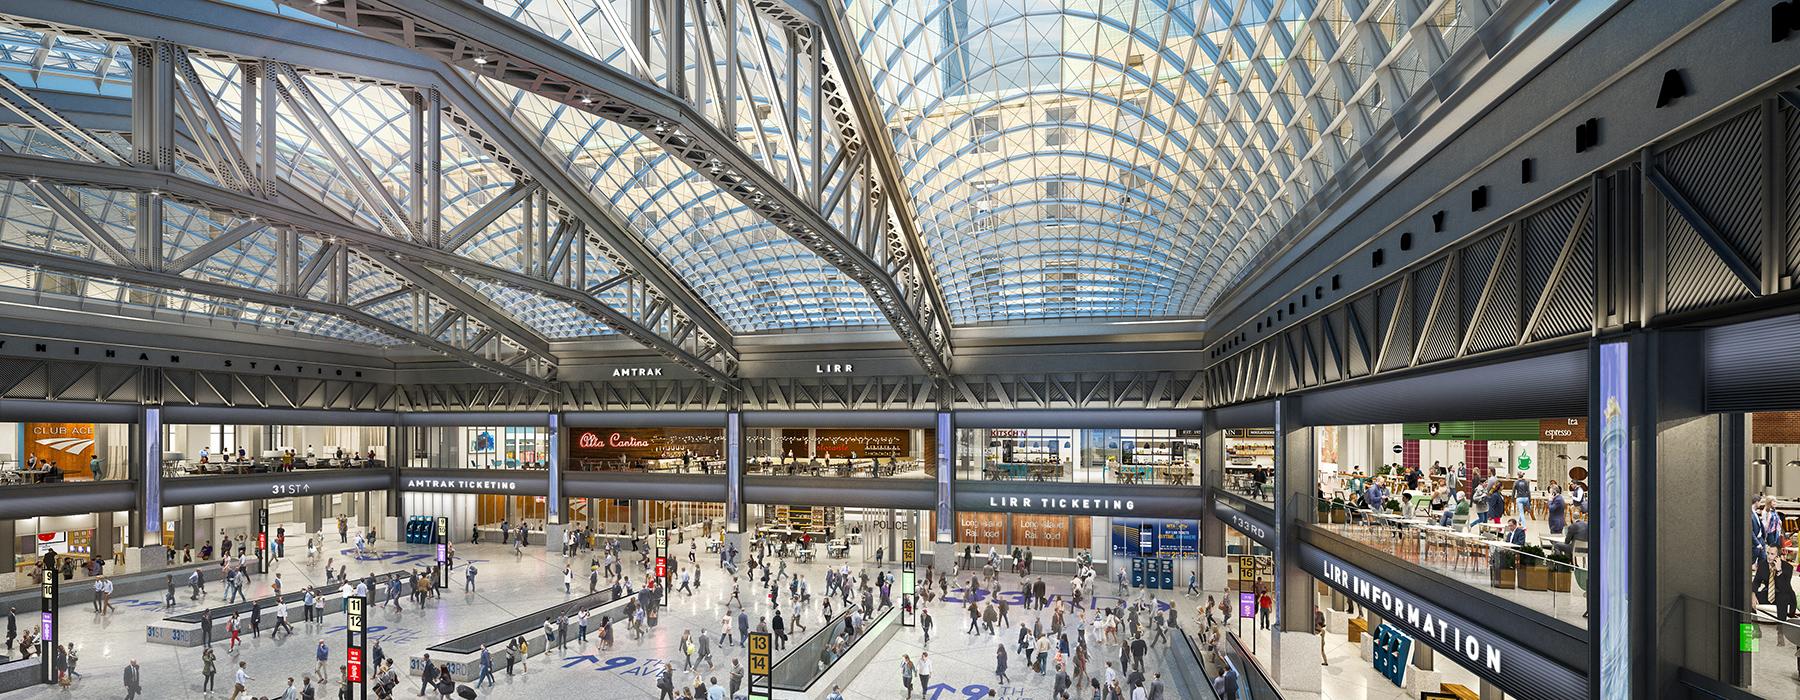 penn-station-new-moynihan-train-hall-new-york-SOM-designboom-1800.jpg